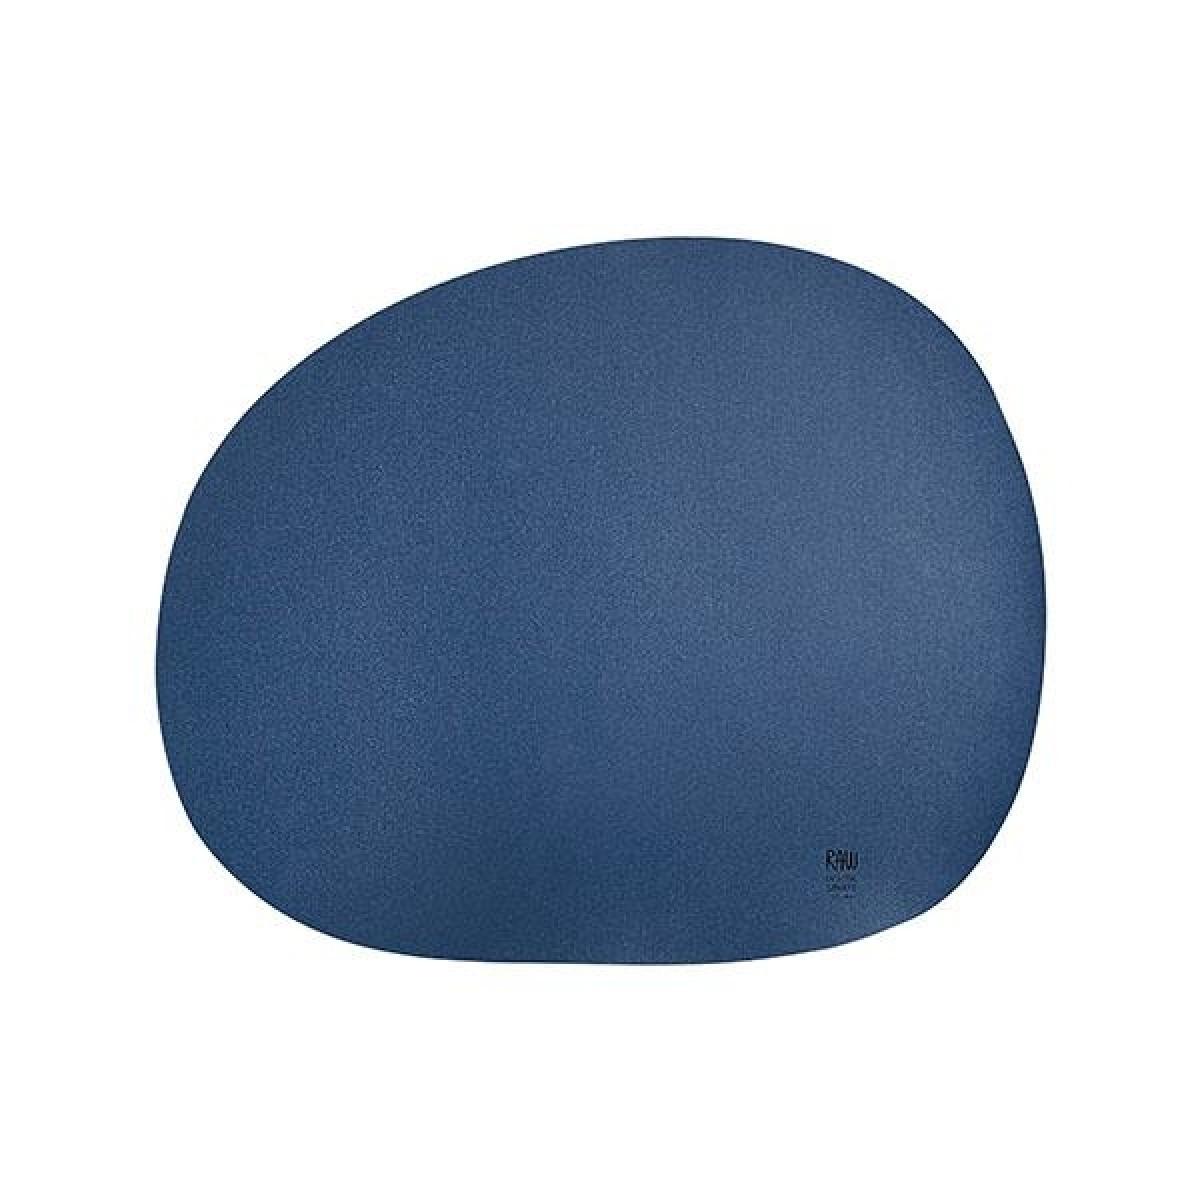 AIDA Raw dækkeserviet marine blå